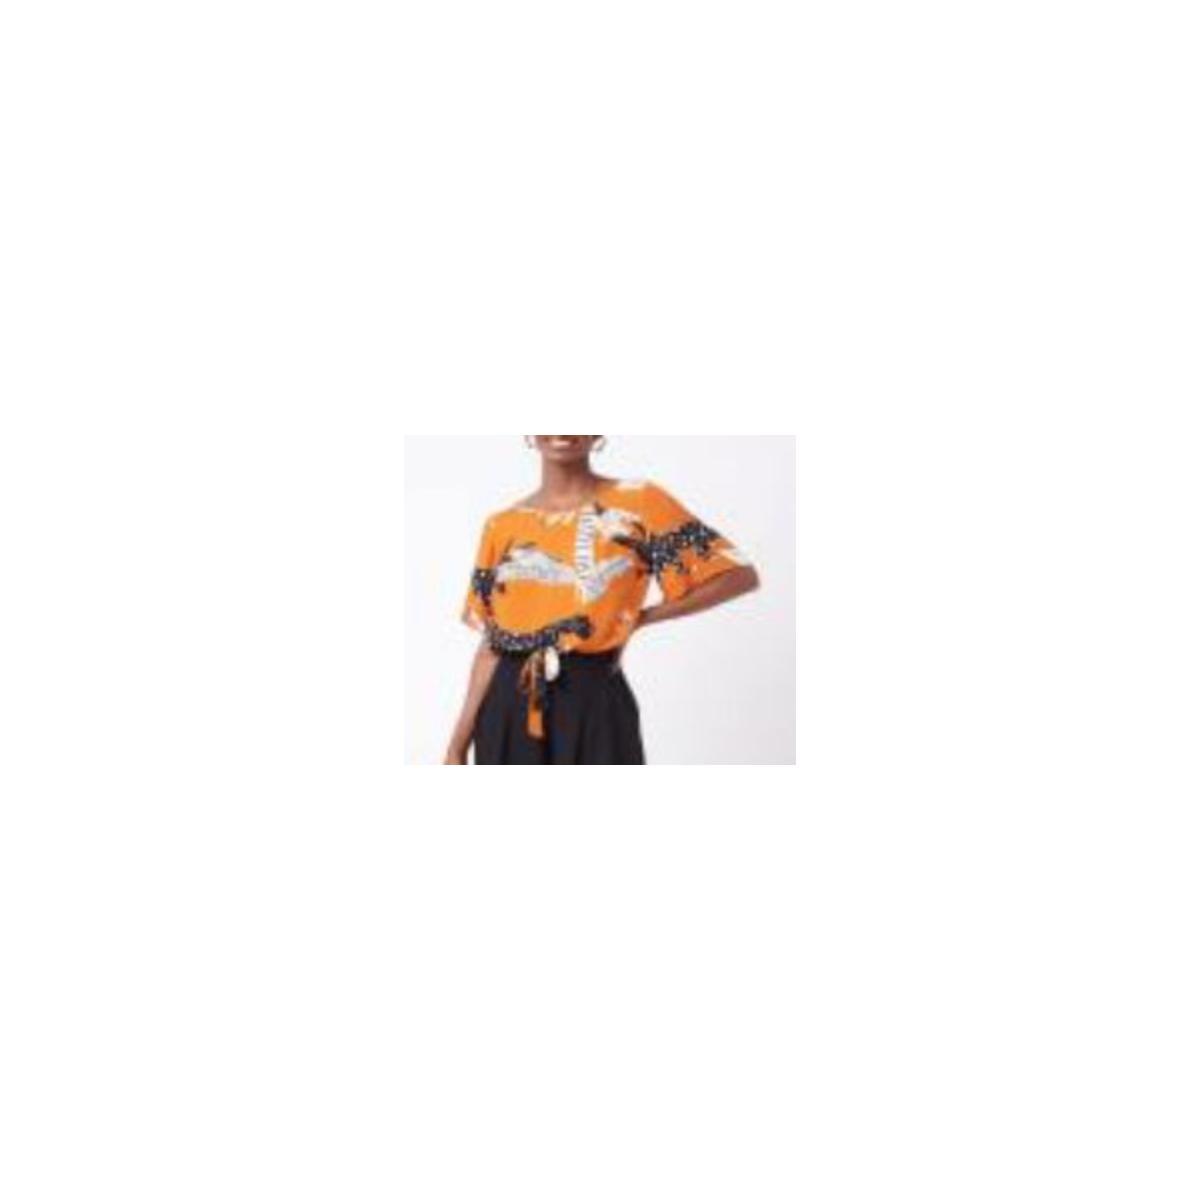 Blusa Feminina Mercatto 2837118 008 Laranja Estampado